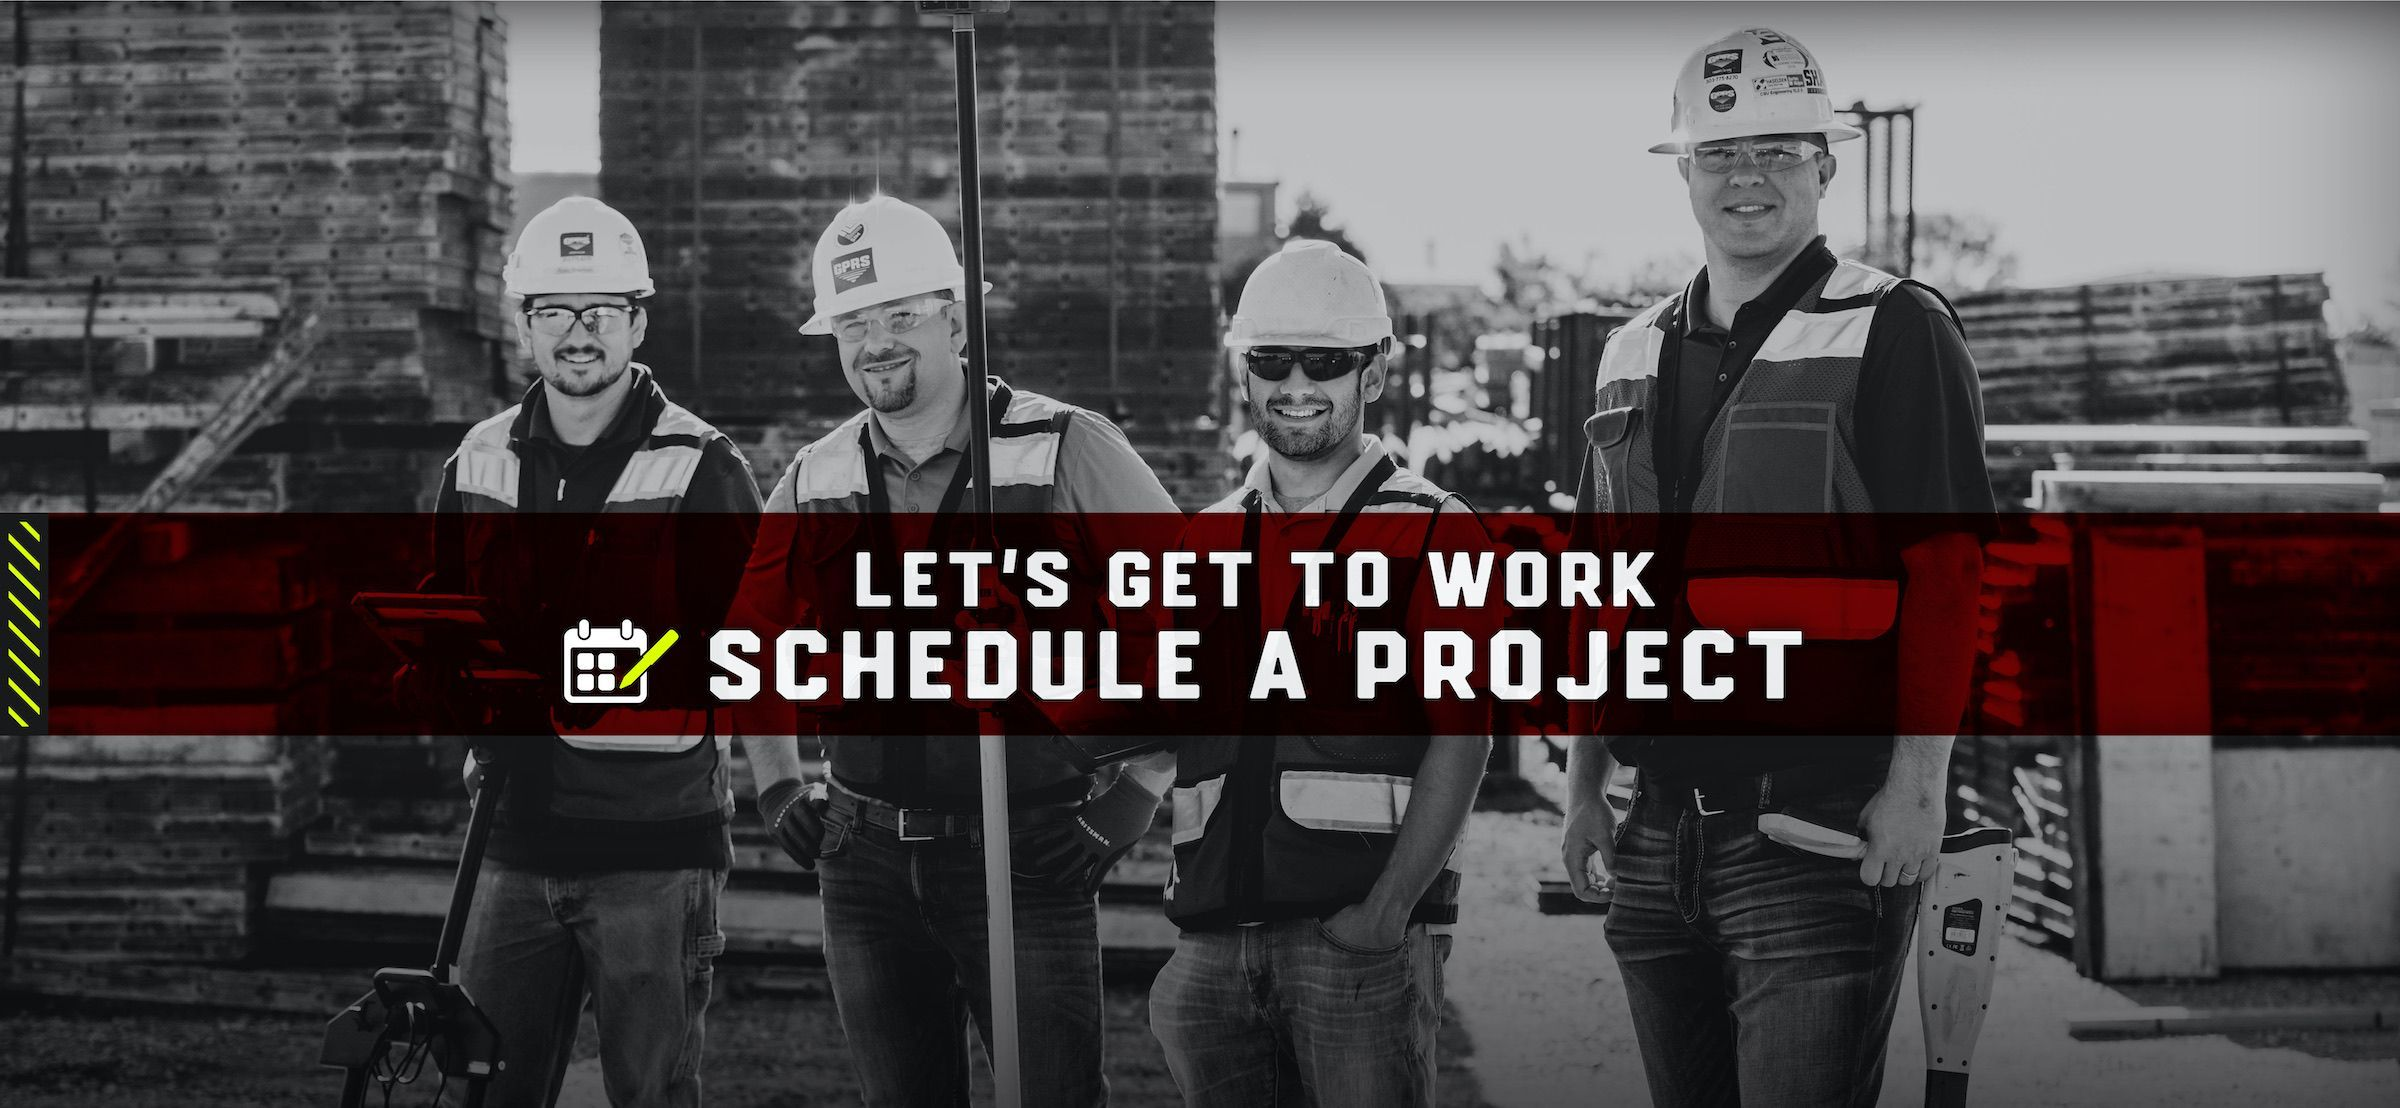 cta-schedule-project.jpg